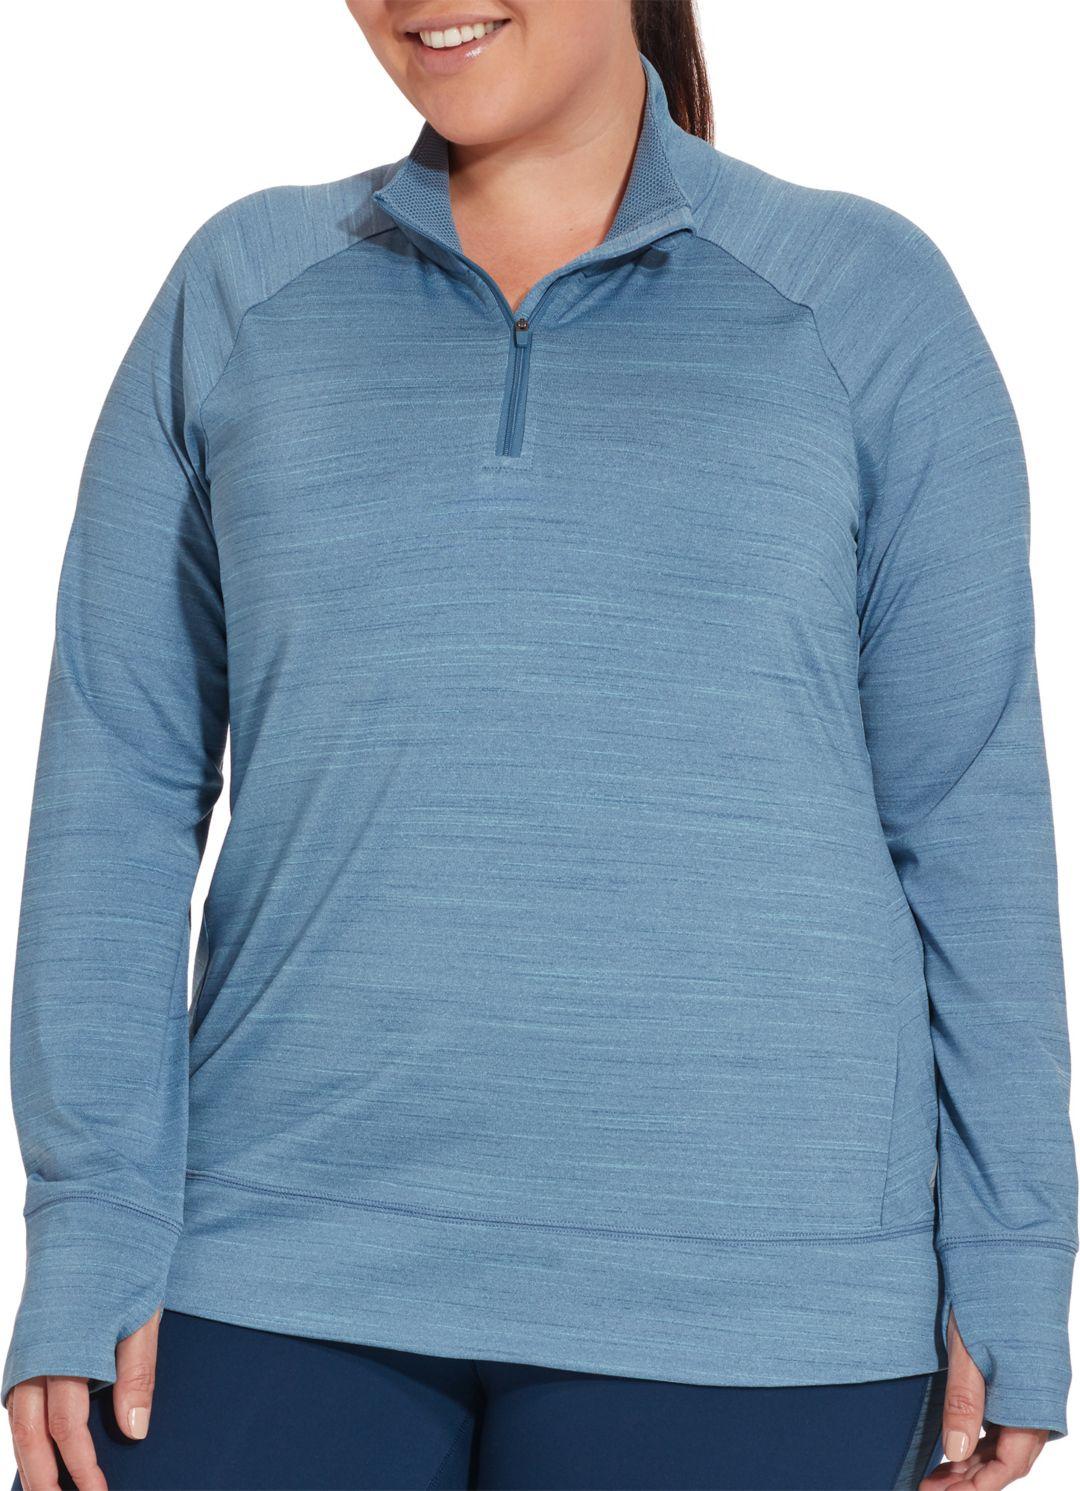 96932eca Reebok Women's Plus Size Cold Weather Compression 1/4 Zip Long Sleeve Shirt